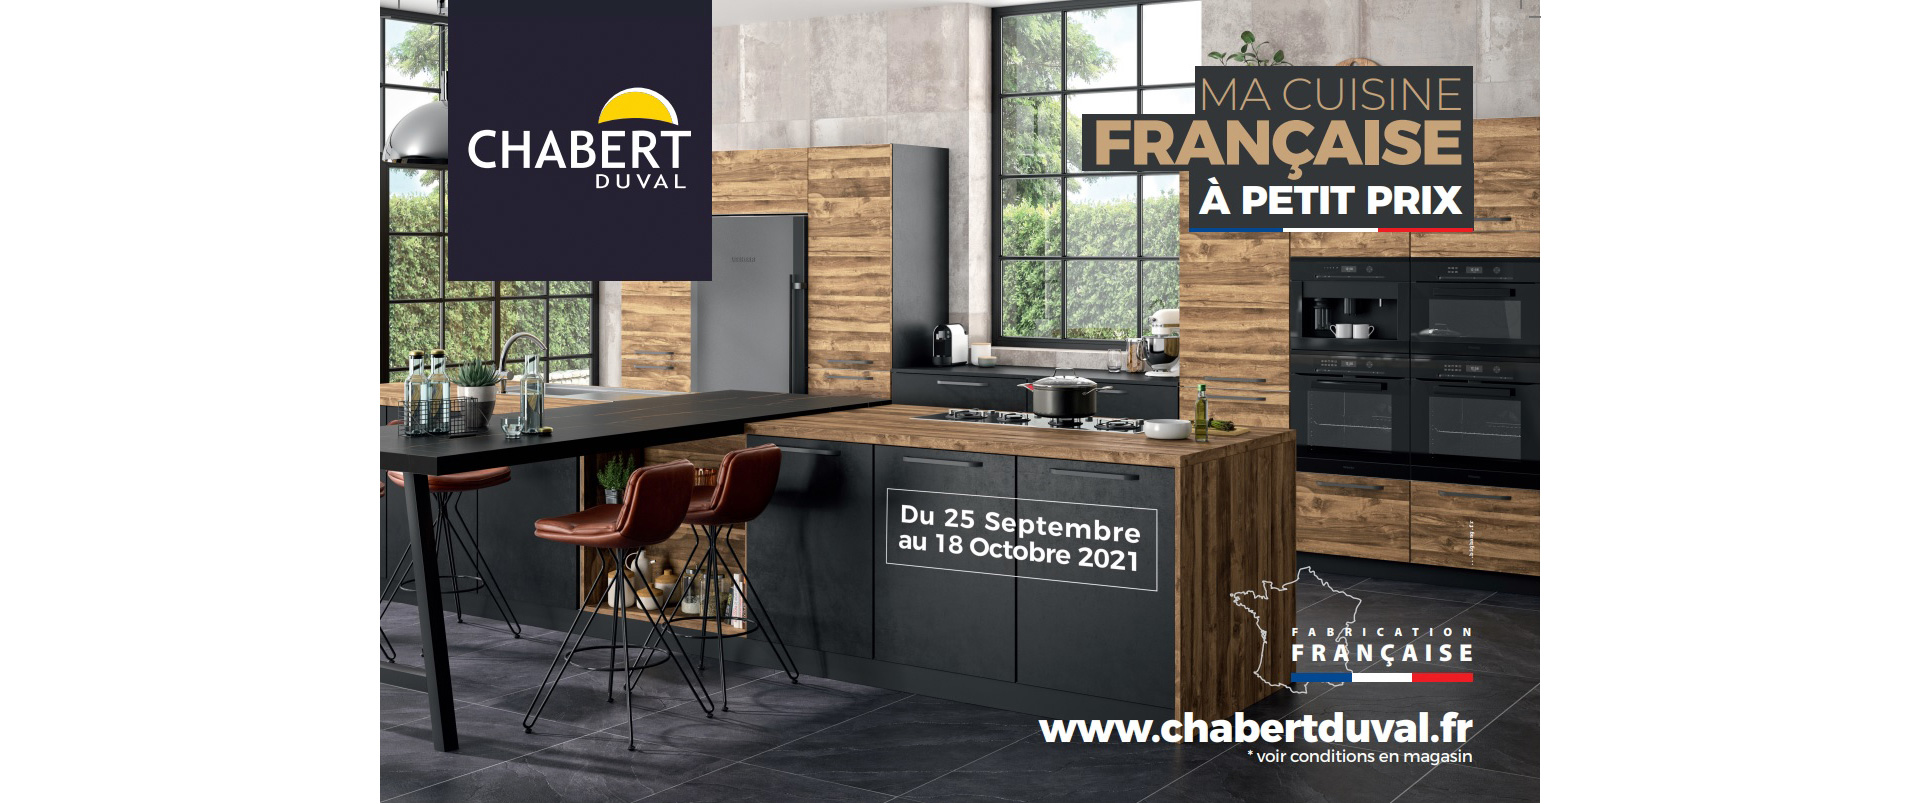 Chabert-Duval